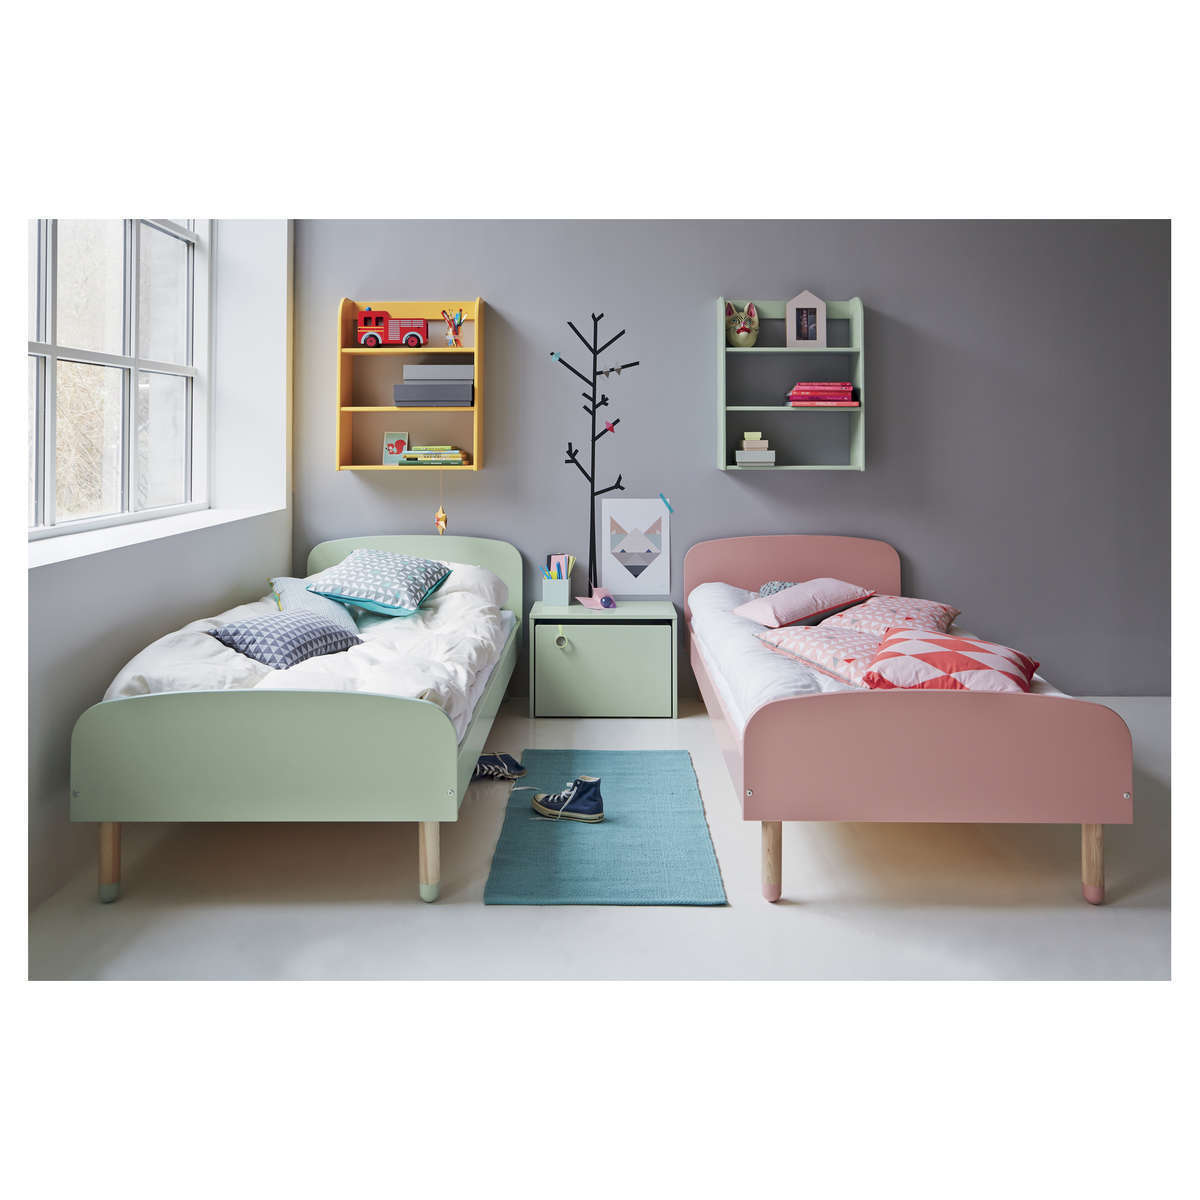 flexa coffre de rangement play menthe rangement jouet. Black Bedroom Furniture Sets. Home Design Ideas